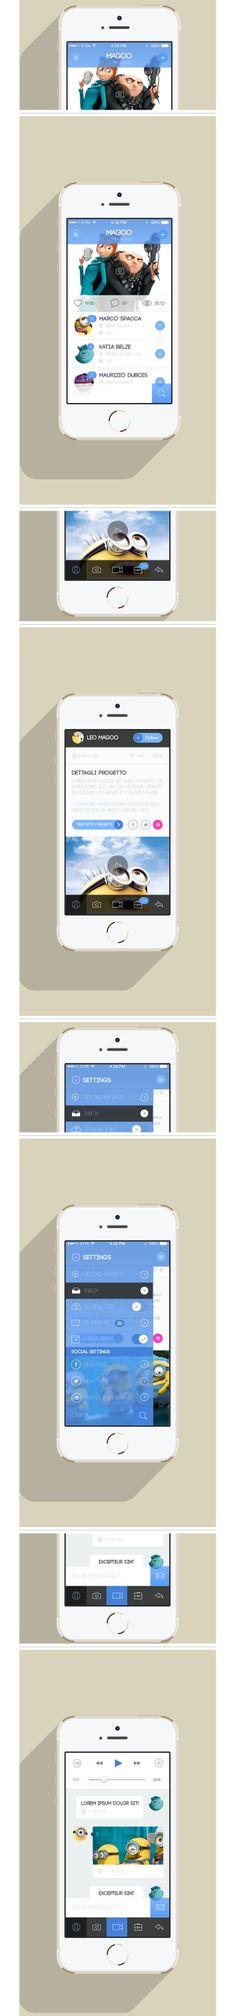 Design application #mobile, kit UI iphone